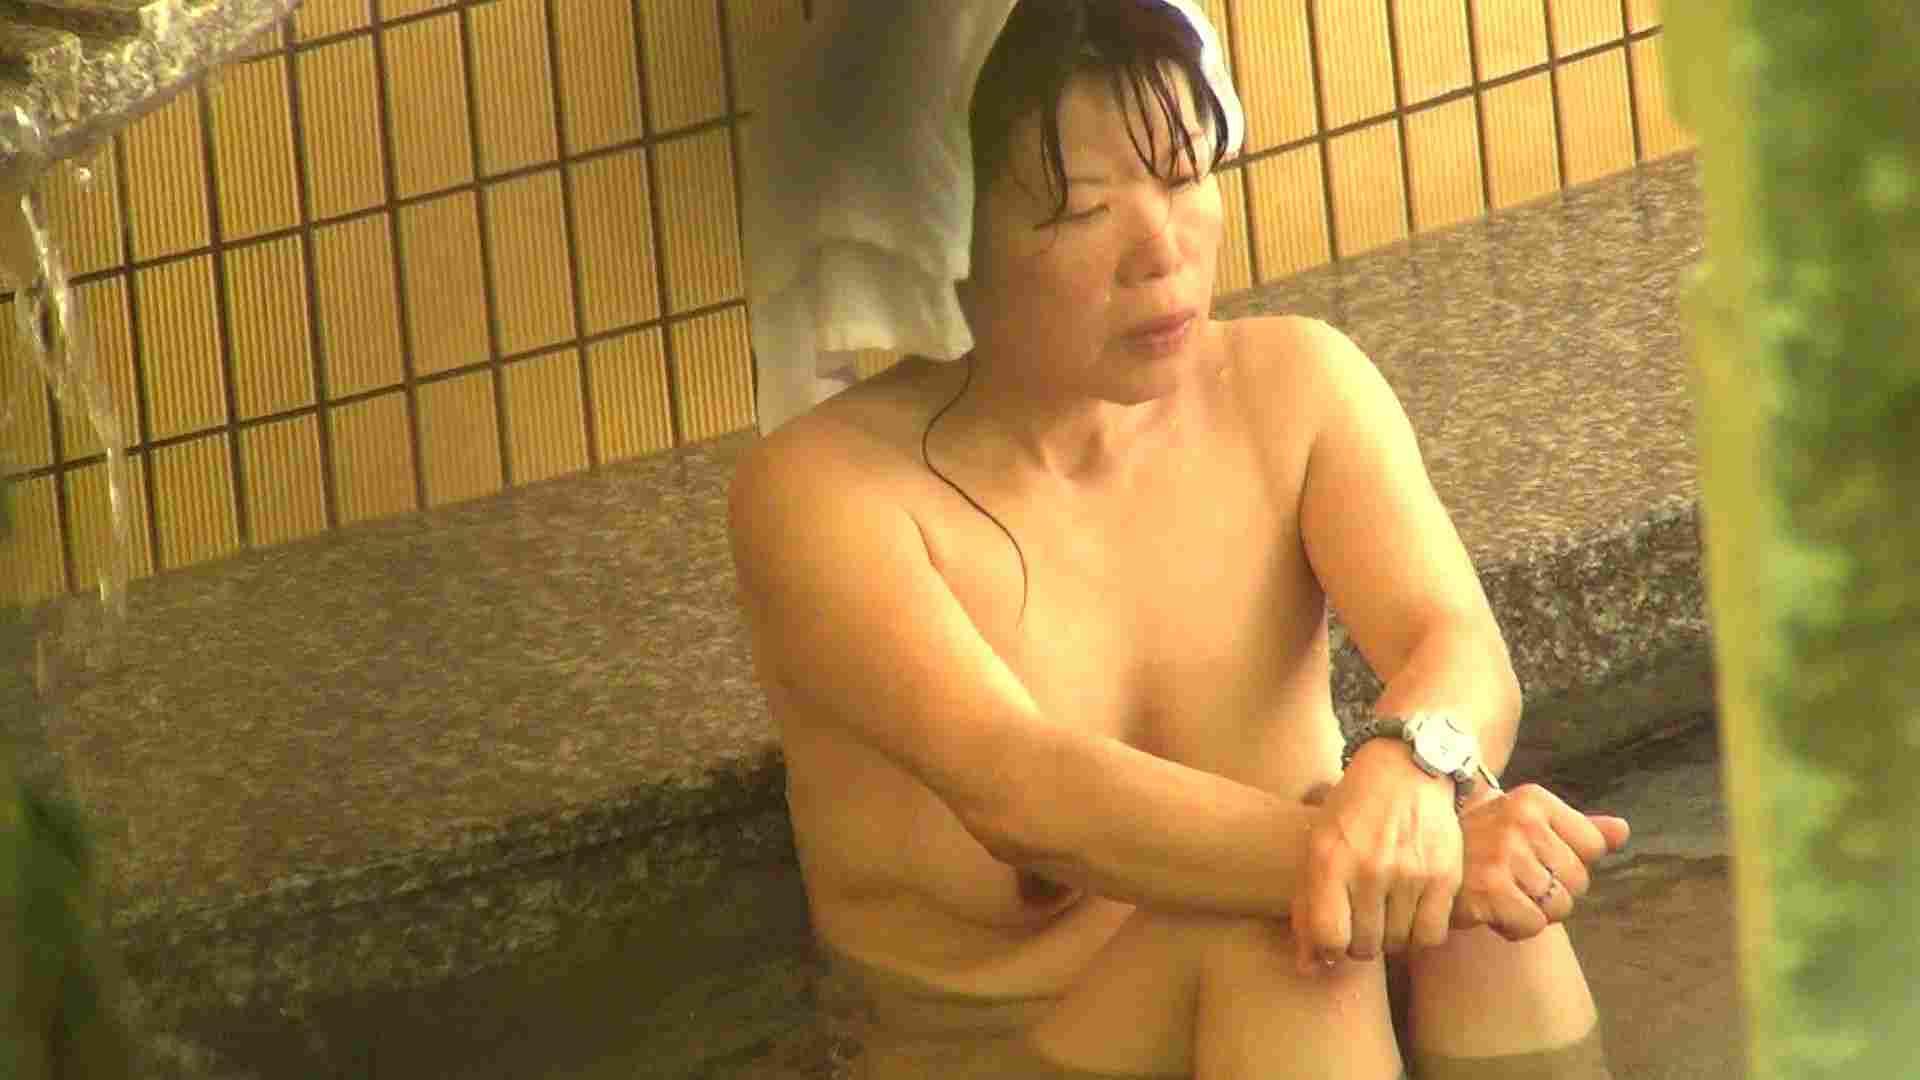 Aquaな露天風呂Vol.305 盗撮シリーズ | 露天風呂編  86PIX 7